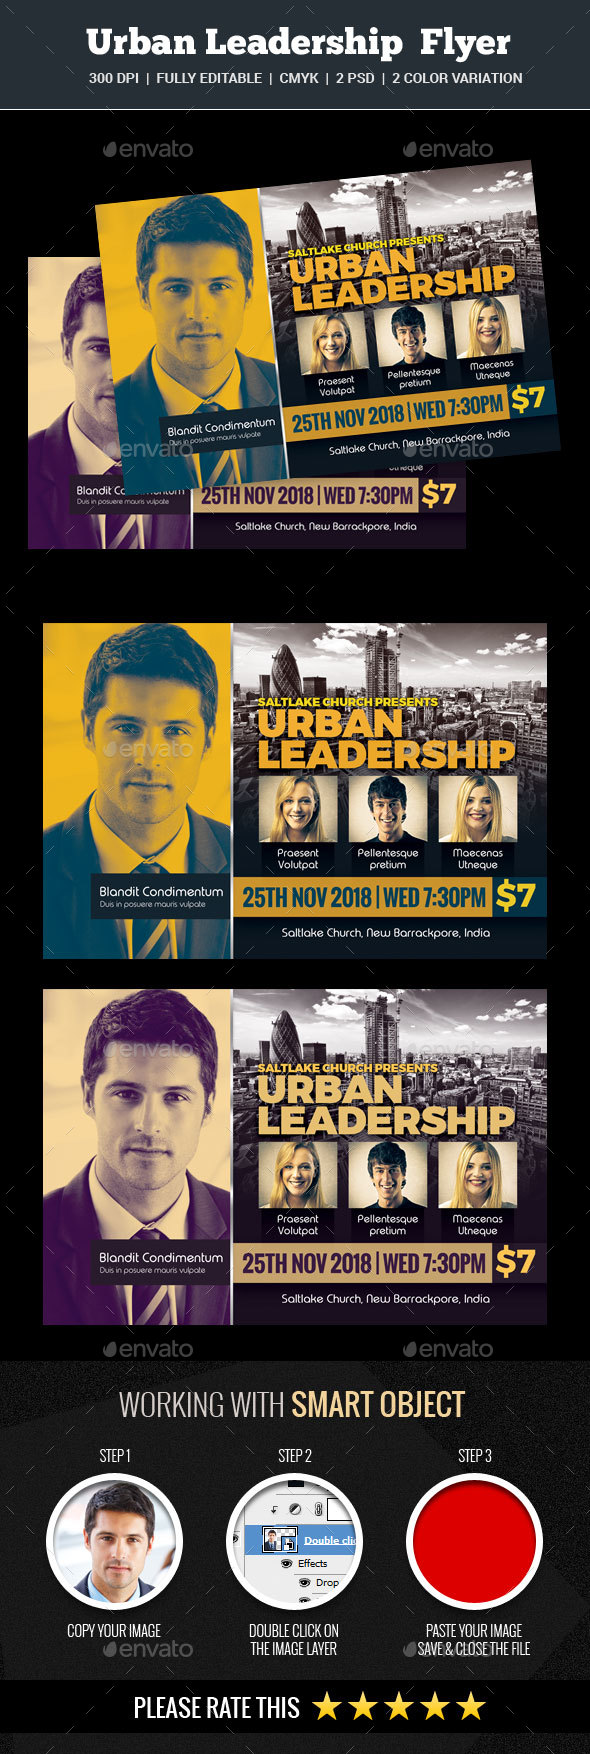 Urban Leadership Flyer - Church Flyers